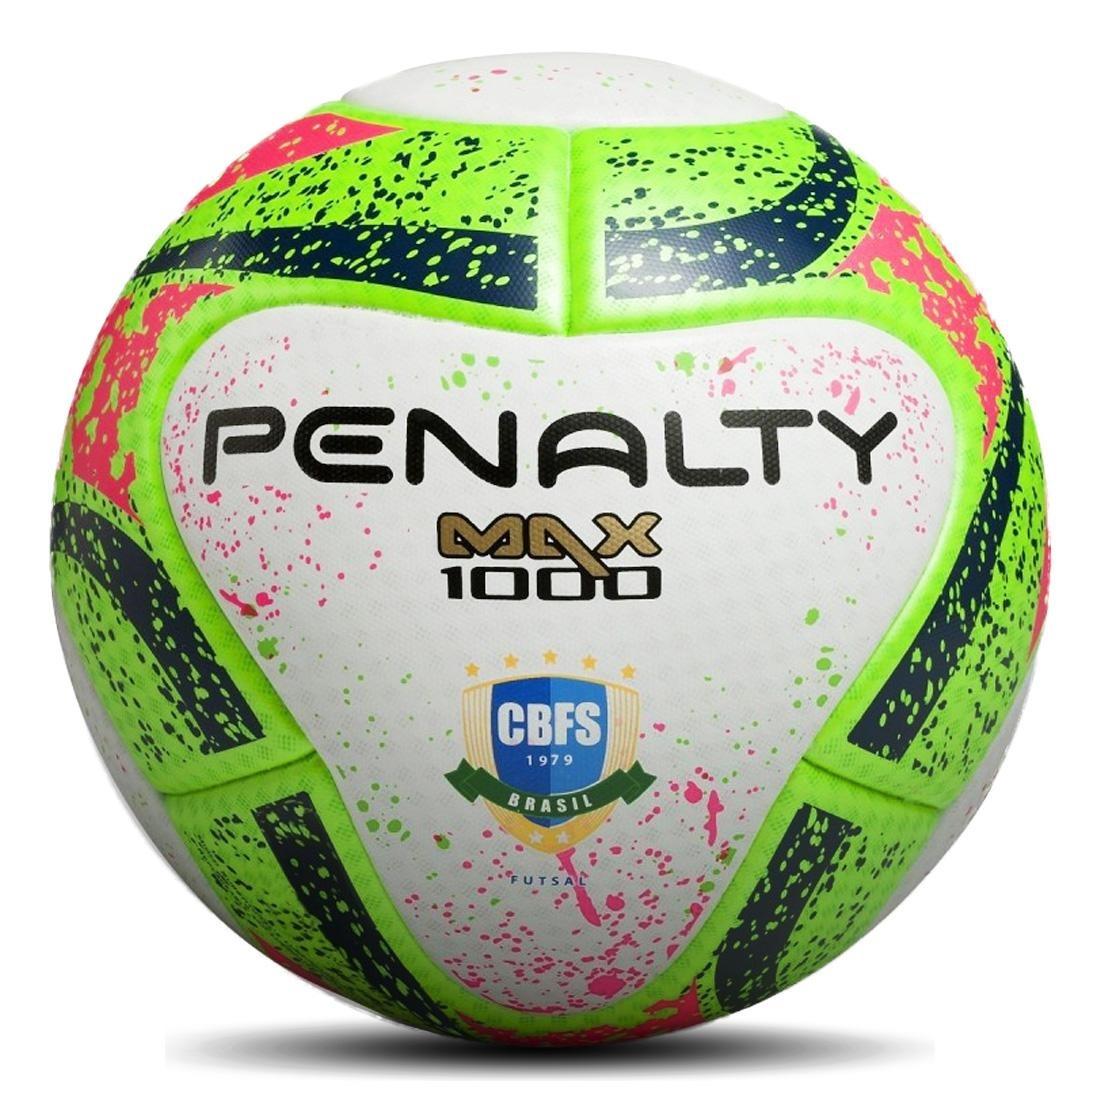 9fbe5d9b9 bola futsal penalty max 1000 vii aprovada fifa. Carregando zoom.